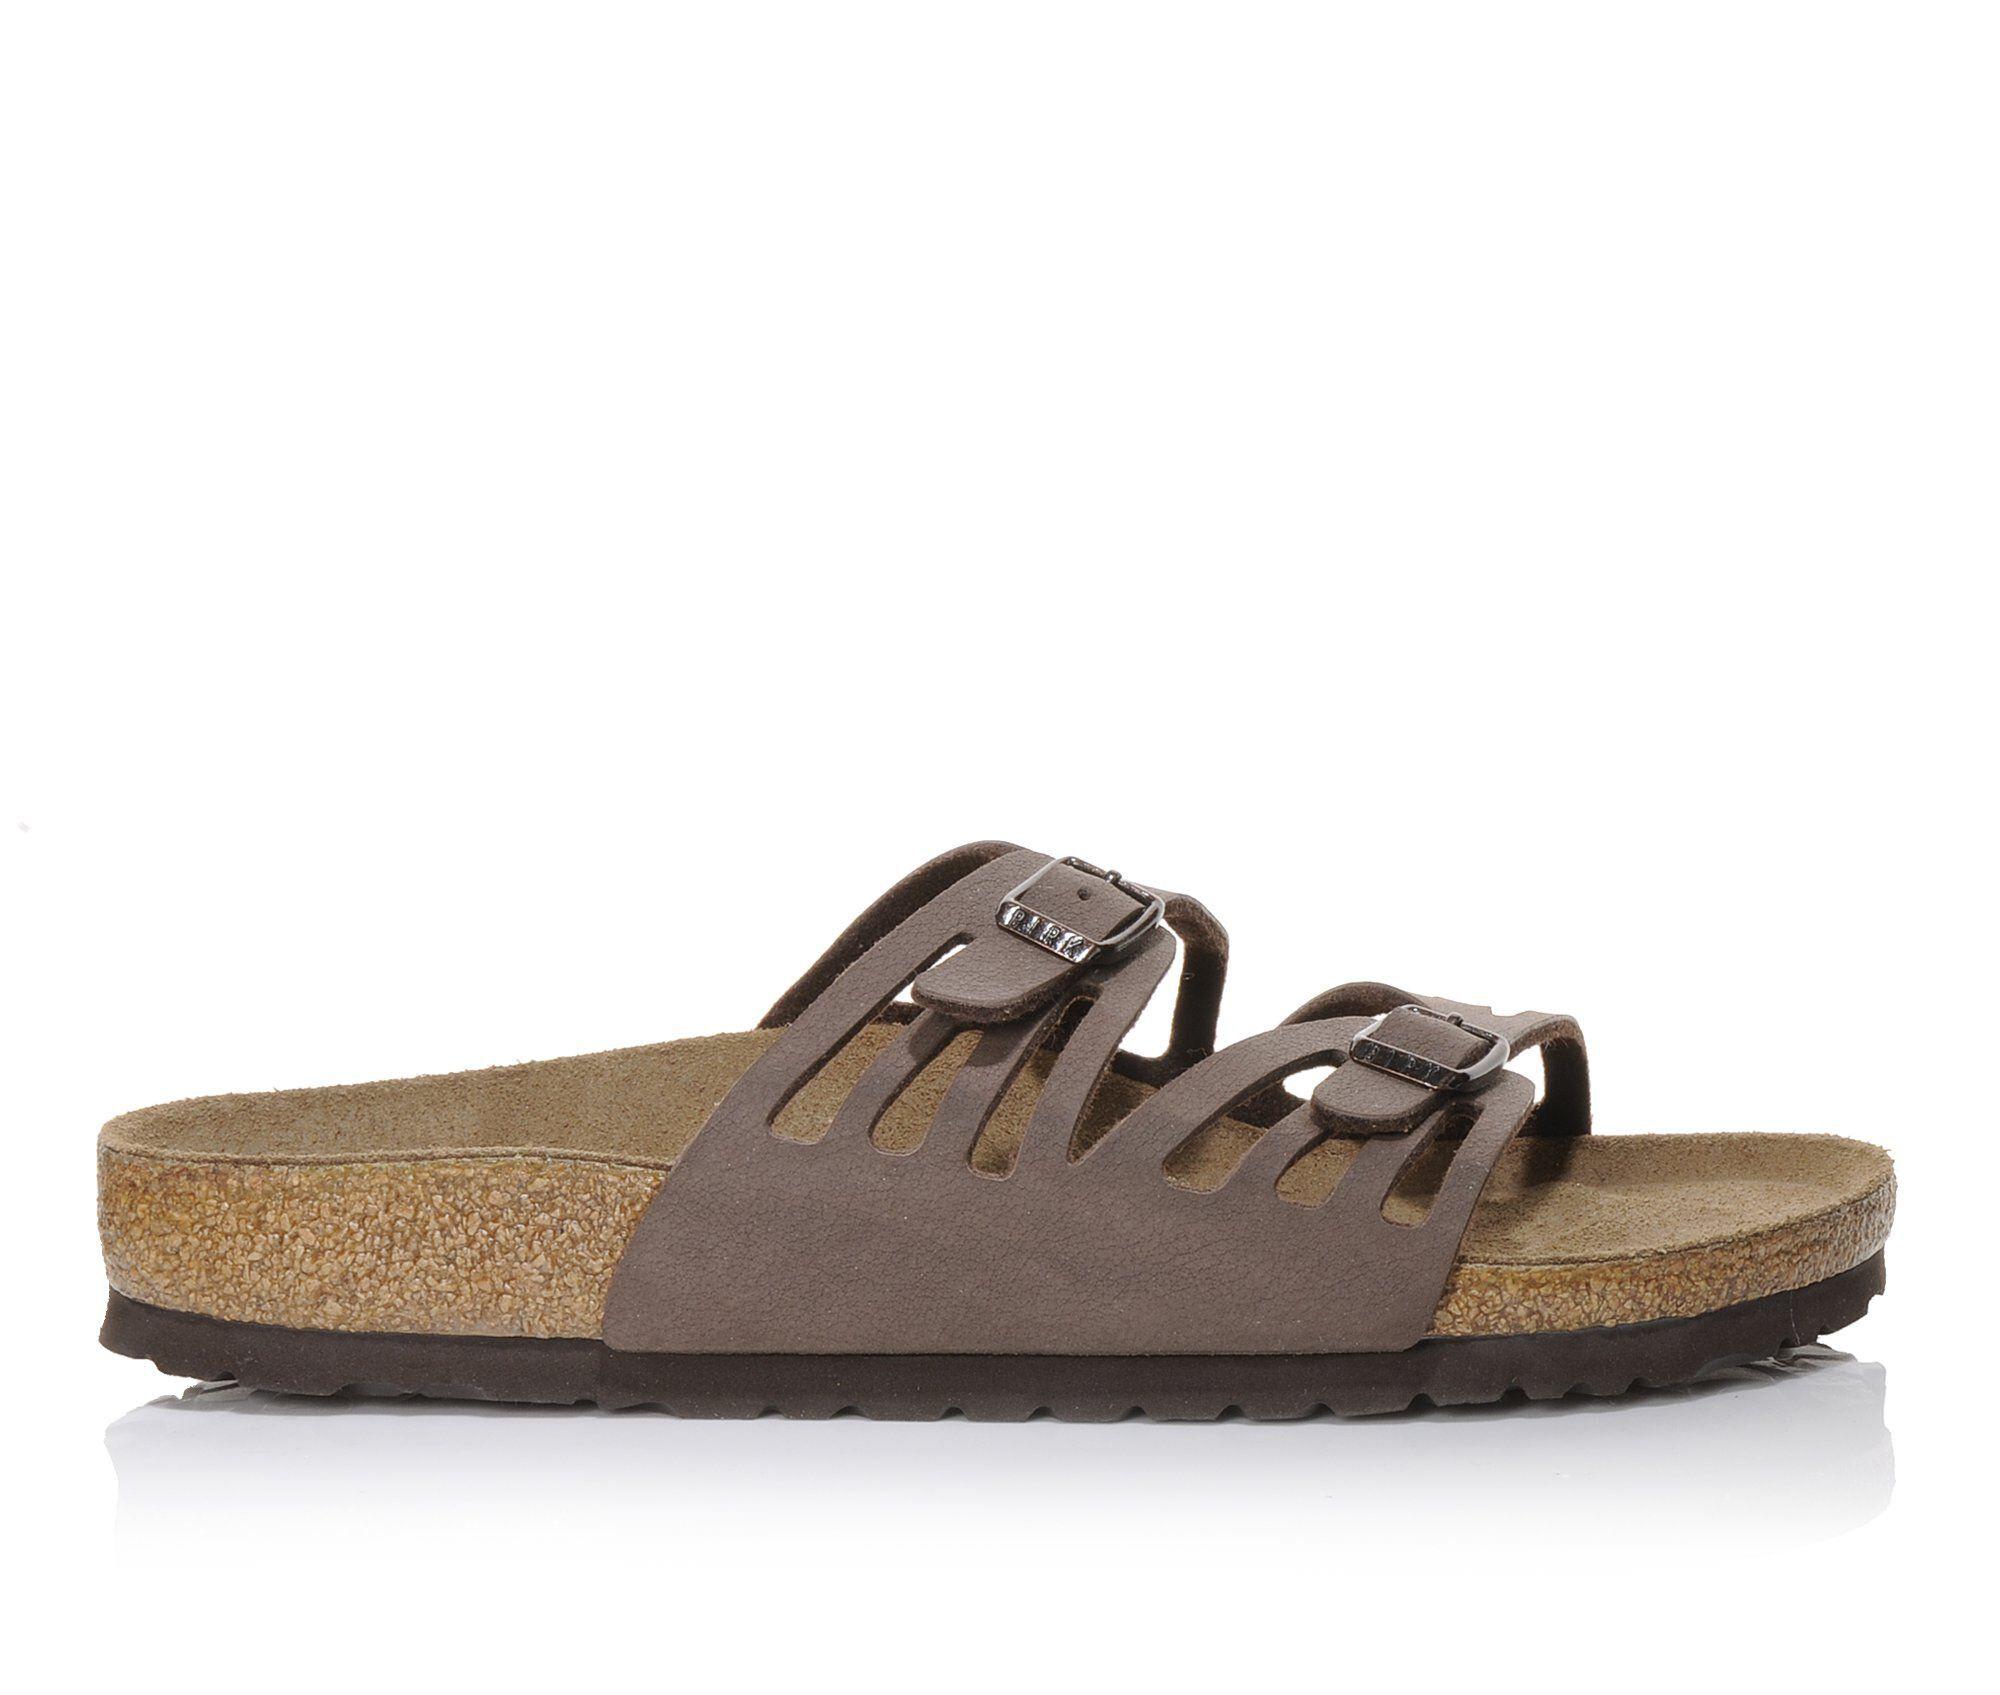 uk shoes_kd7129